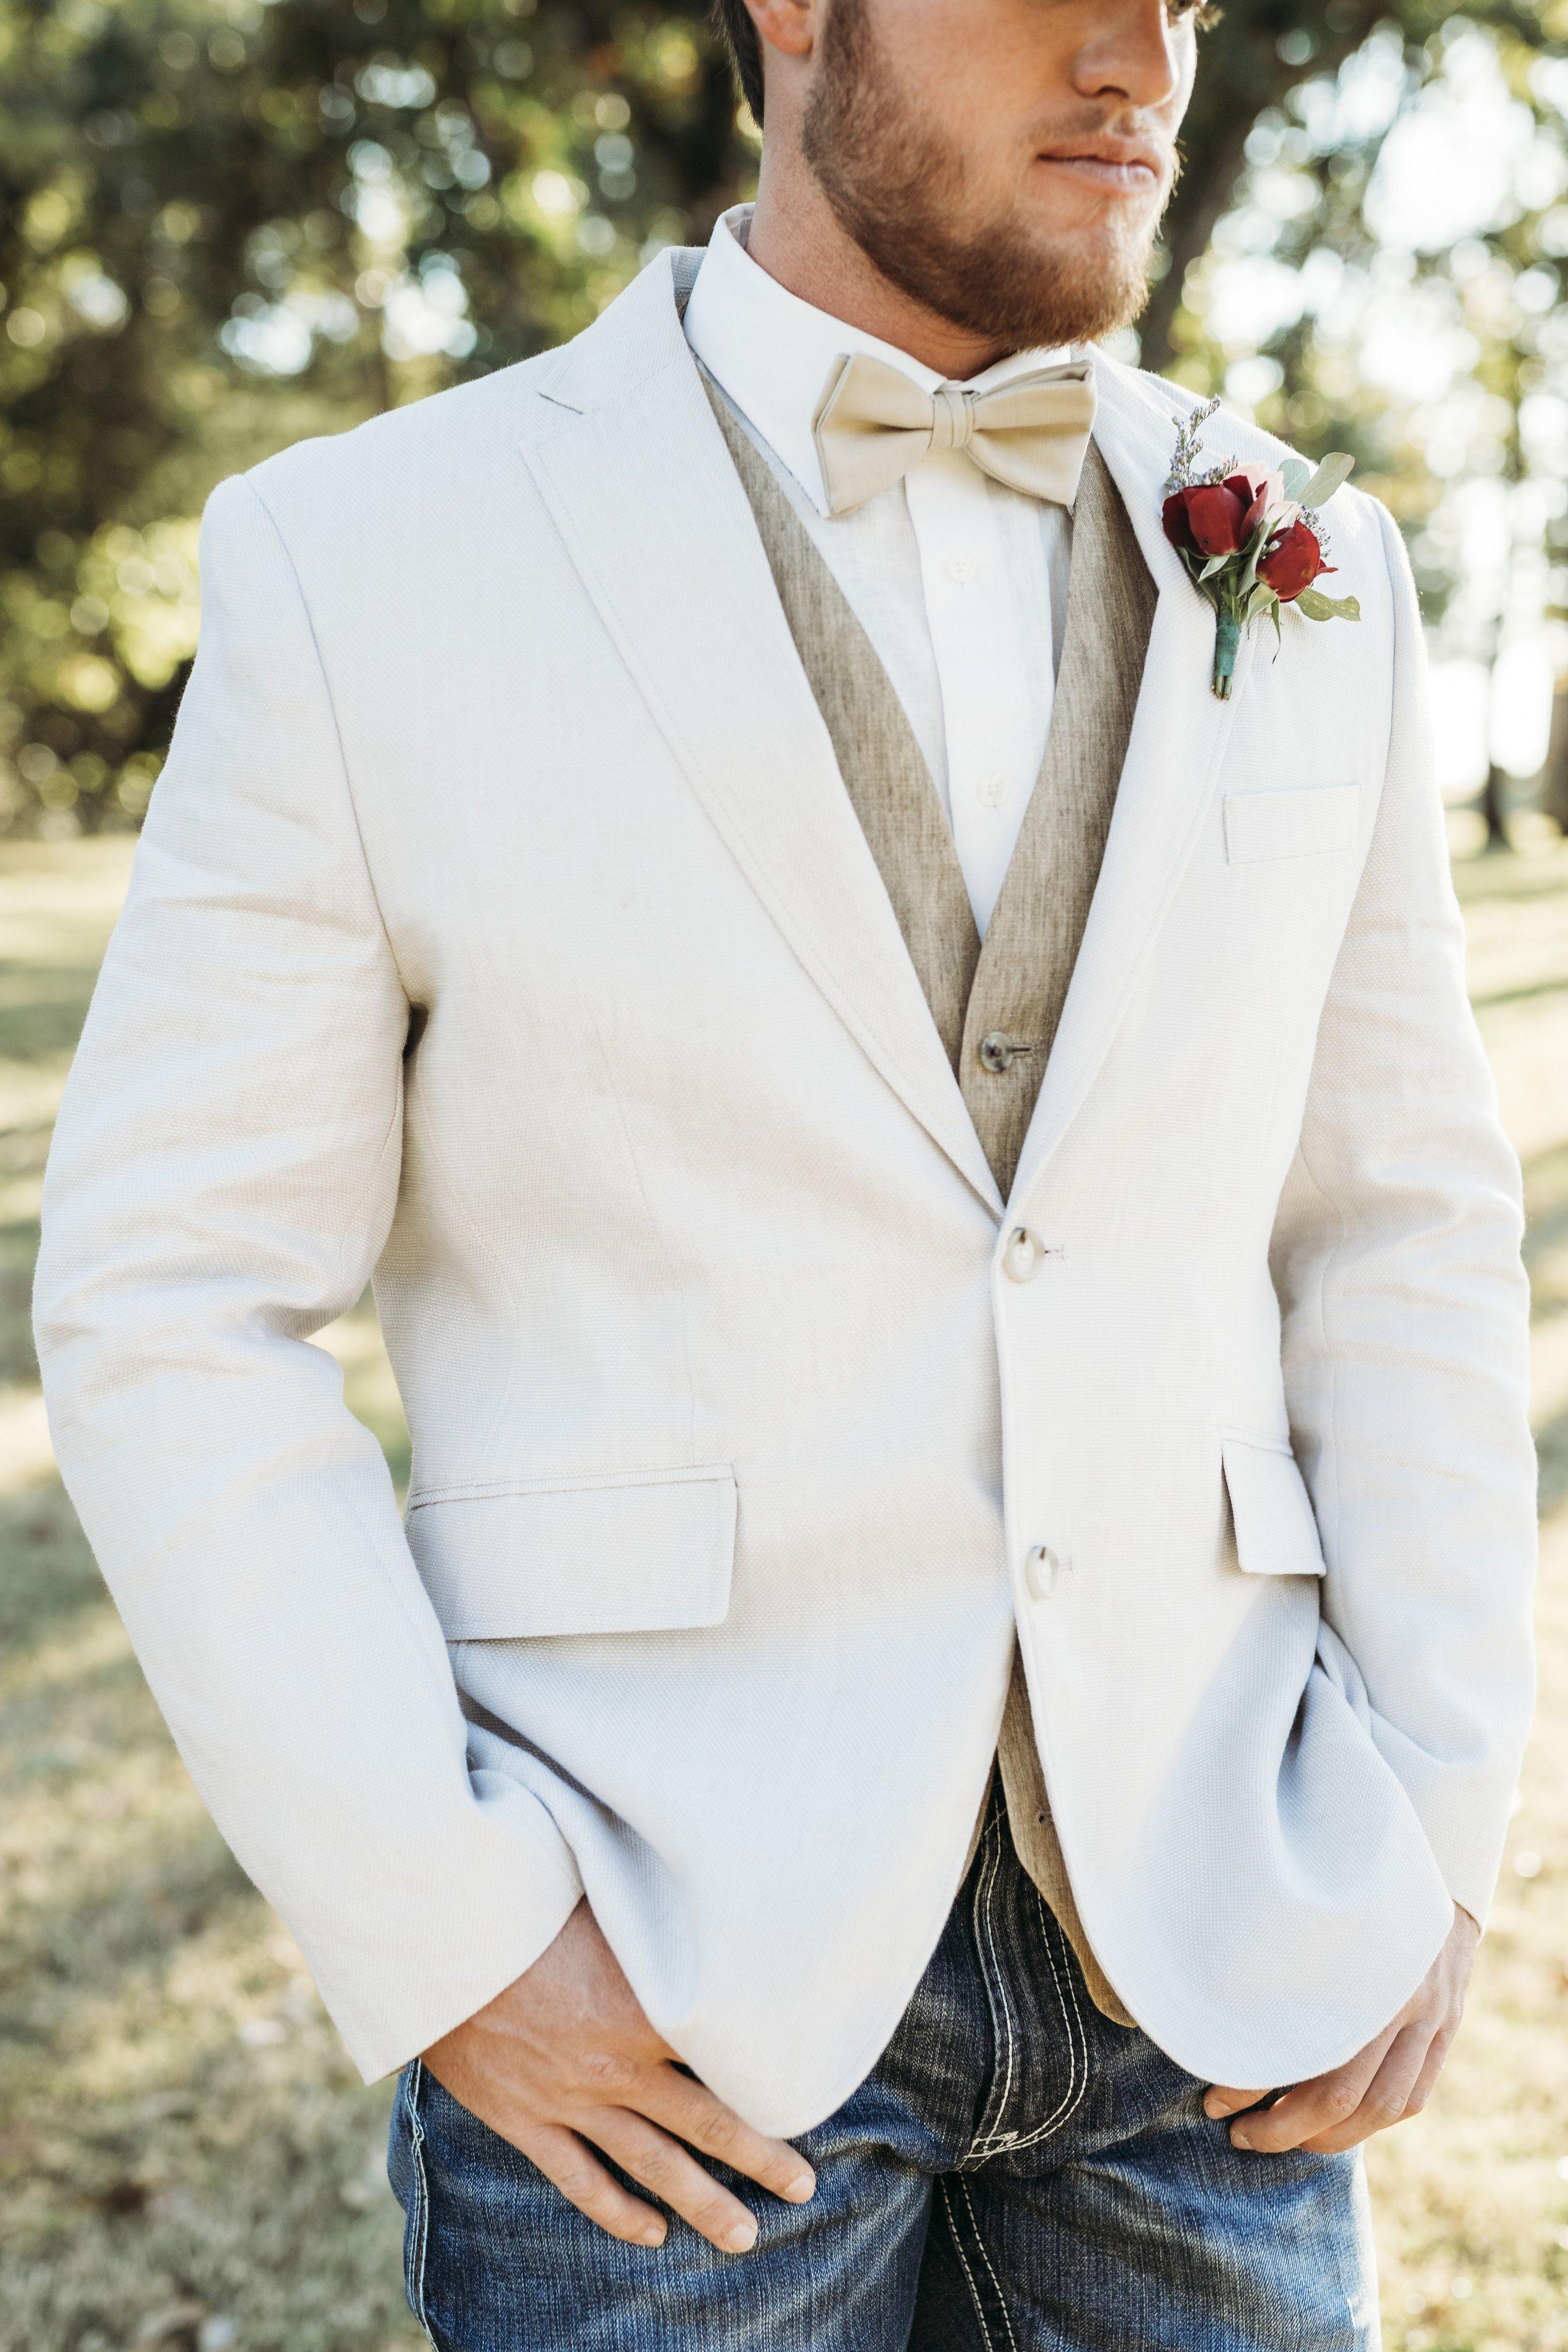 Wedding Venue Norman Oklahoma With Images Country Wedding Groom Oklahoma Wedding Venues Fall Country Wedding